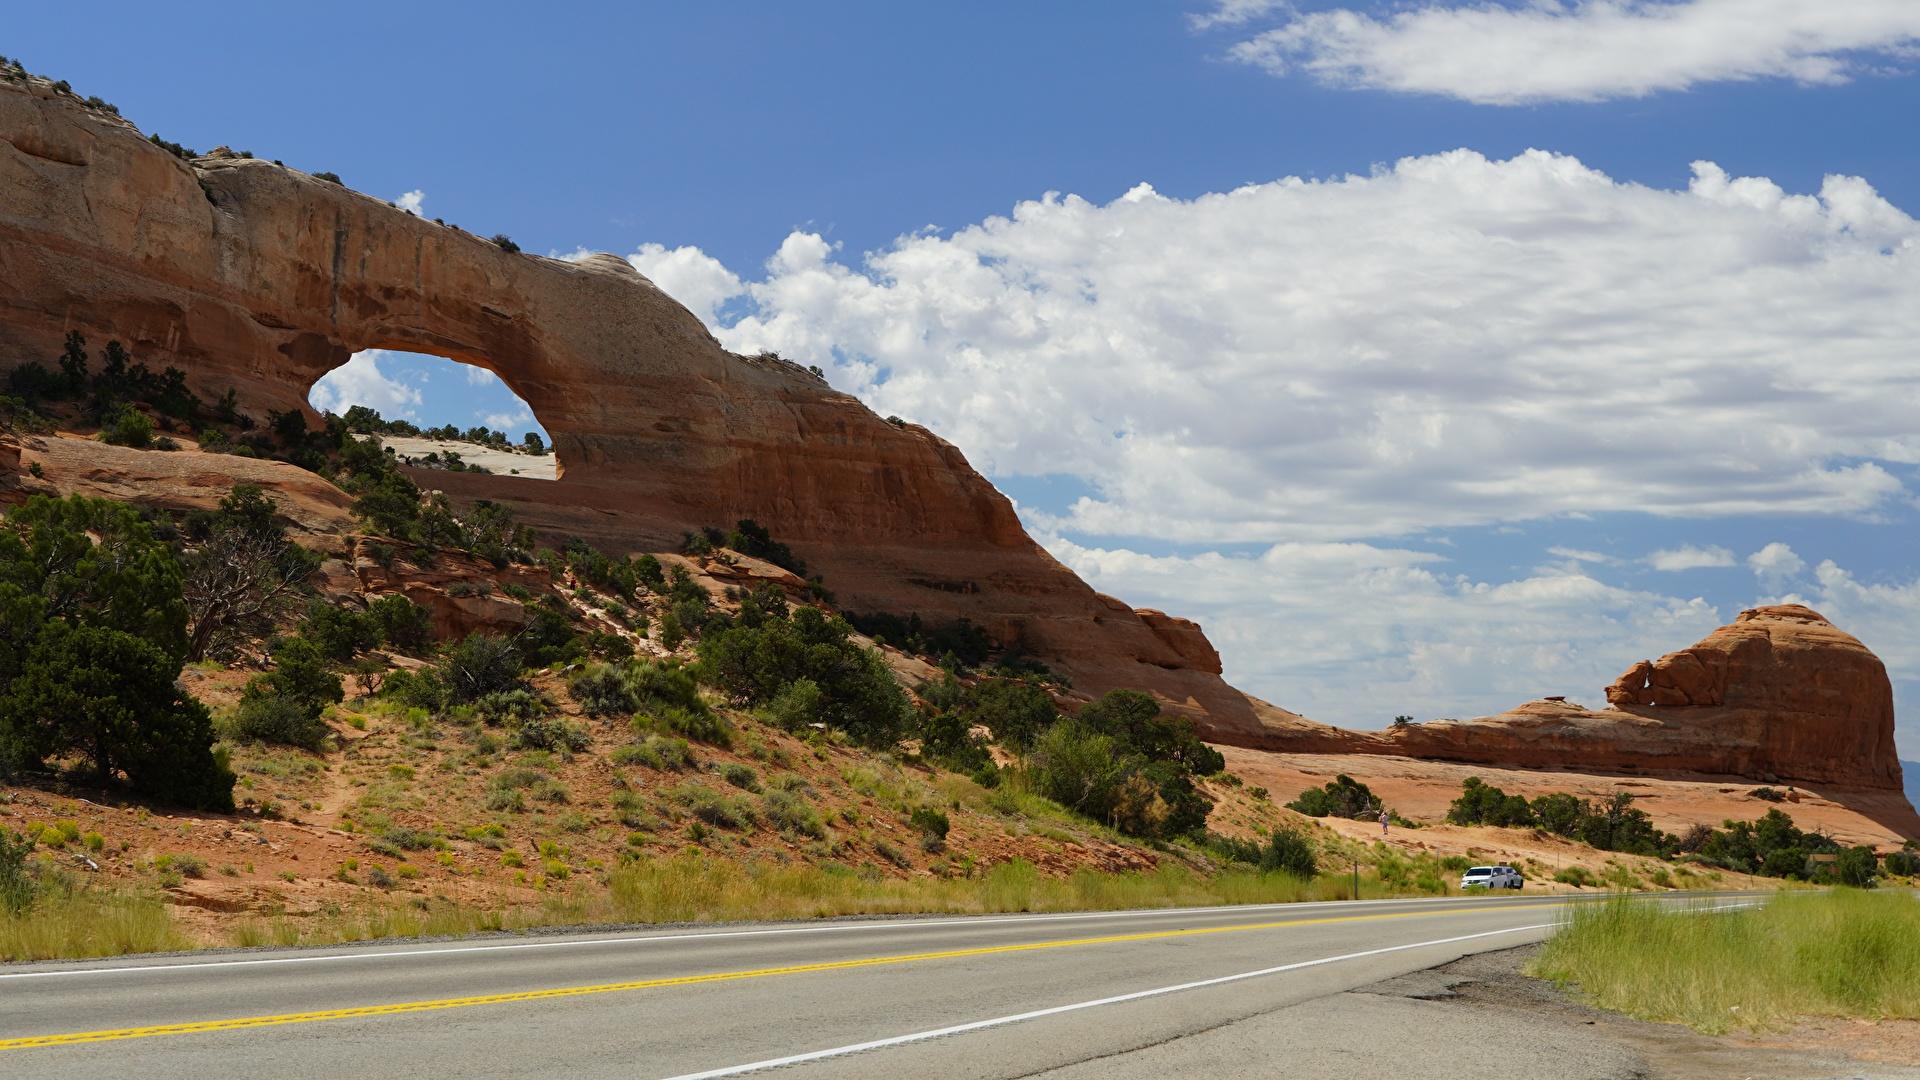 Photos USA Arch Bryce Canyon National Park, Utah Rock Nature Roads Parks 1920x1080 Crag Cliff park